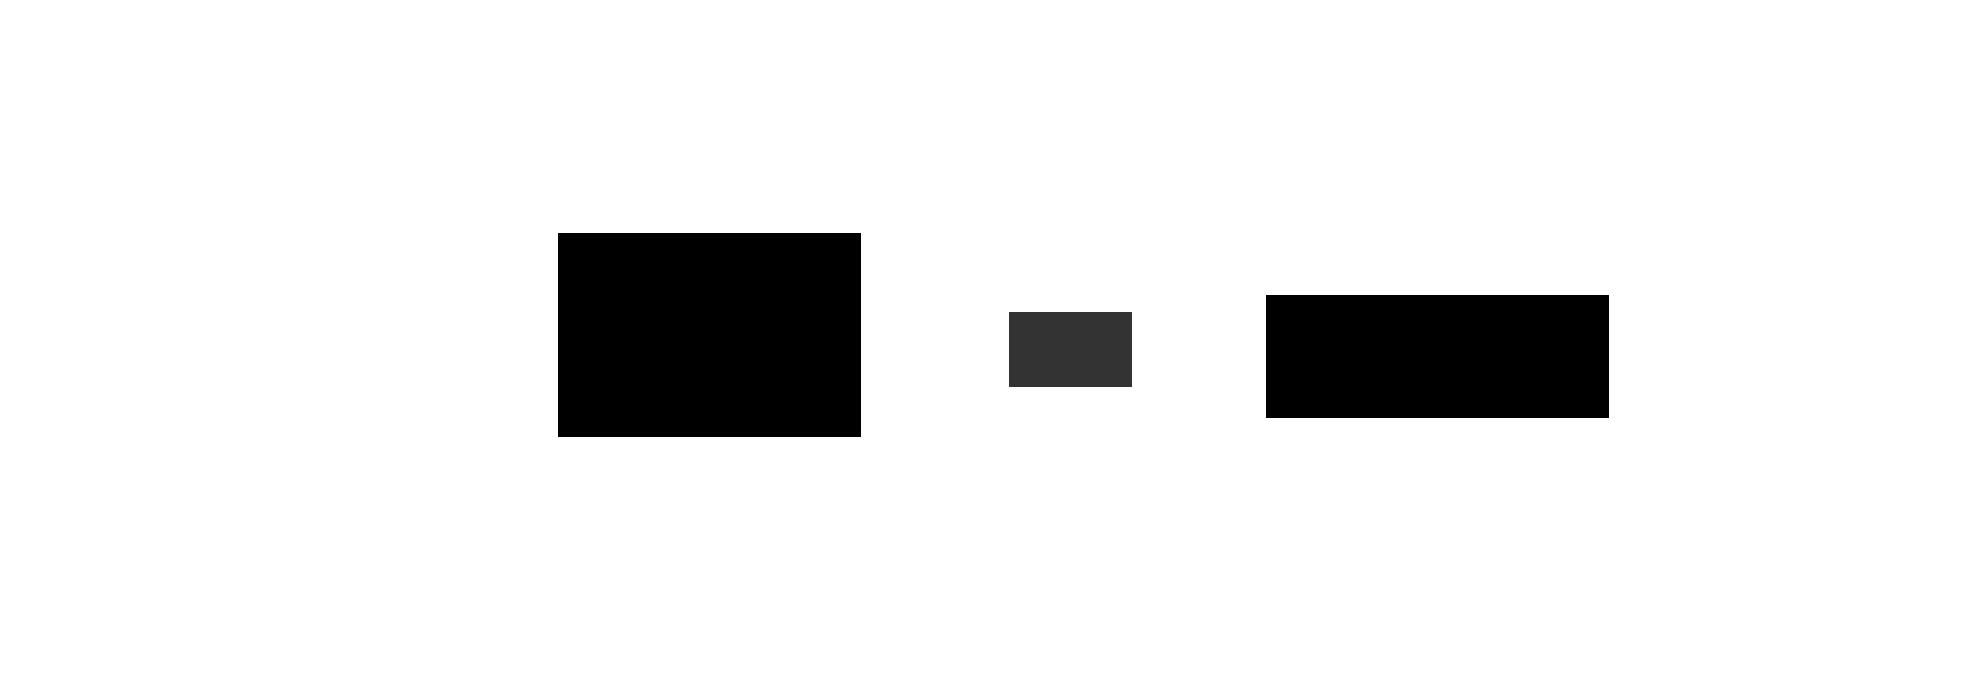 Nike vs. Adidas Header